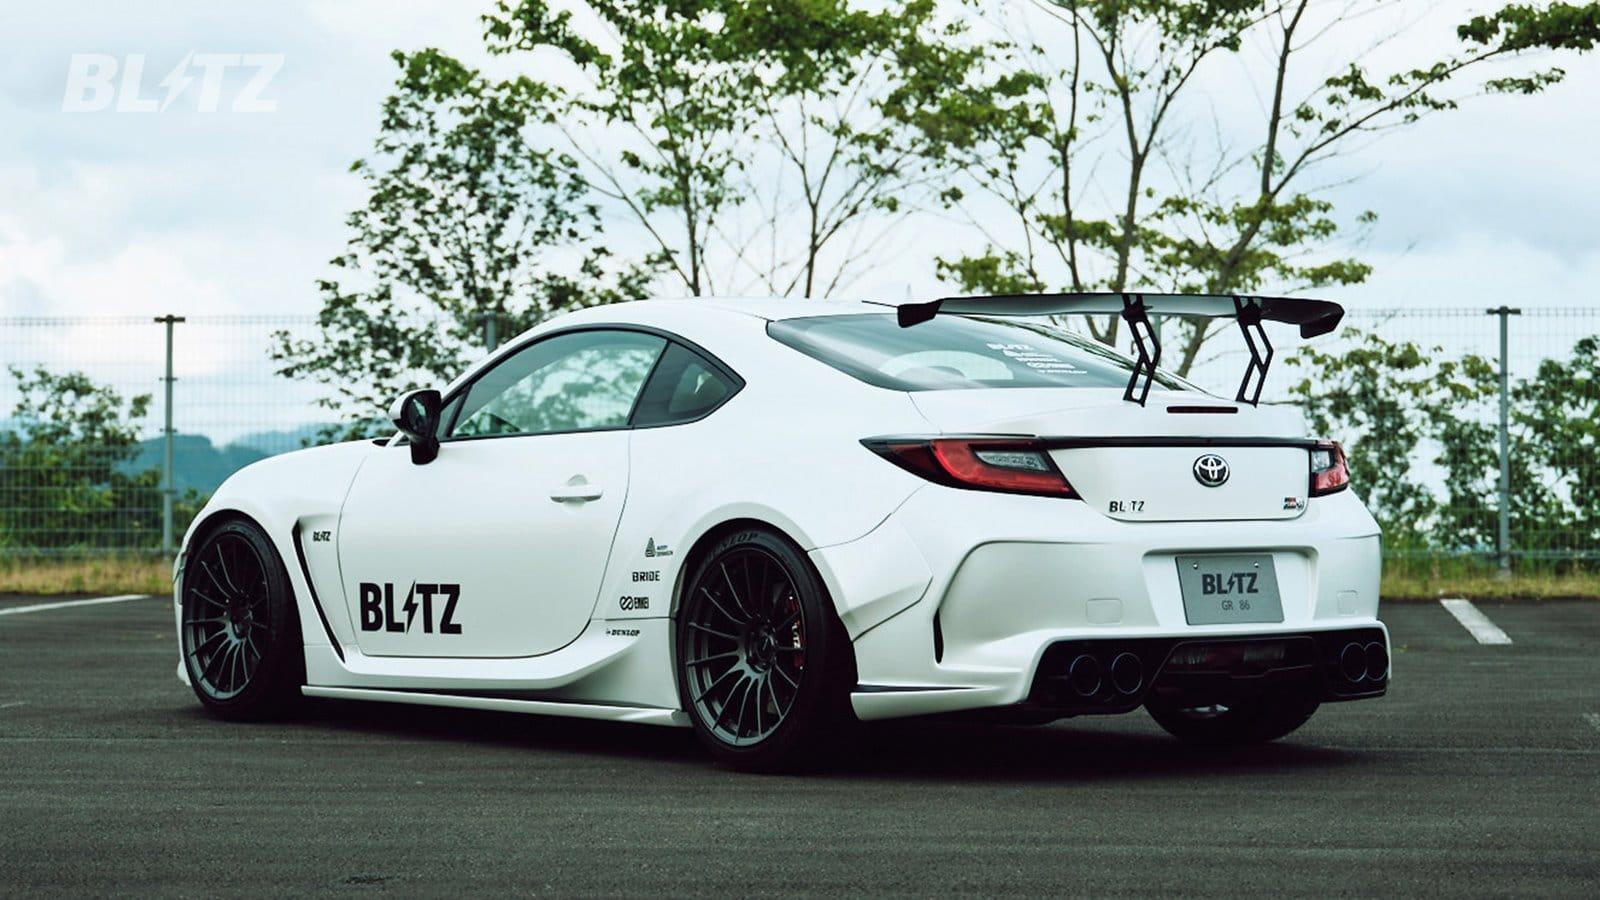 El Blitz GR 86 Concept promete emociones fuertes